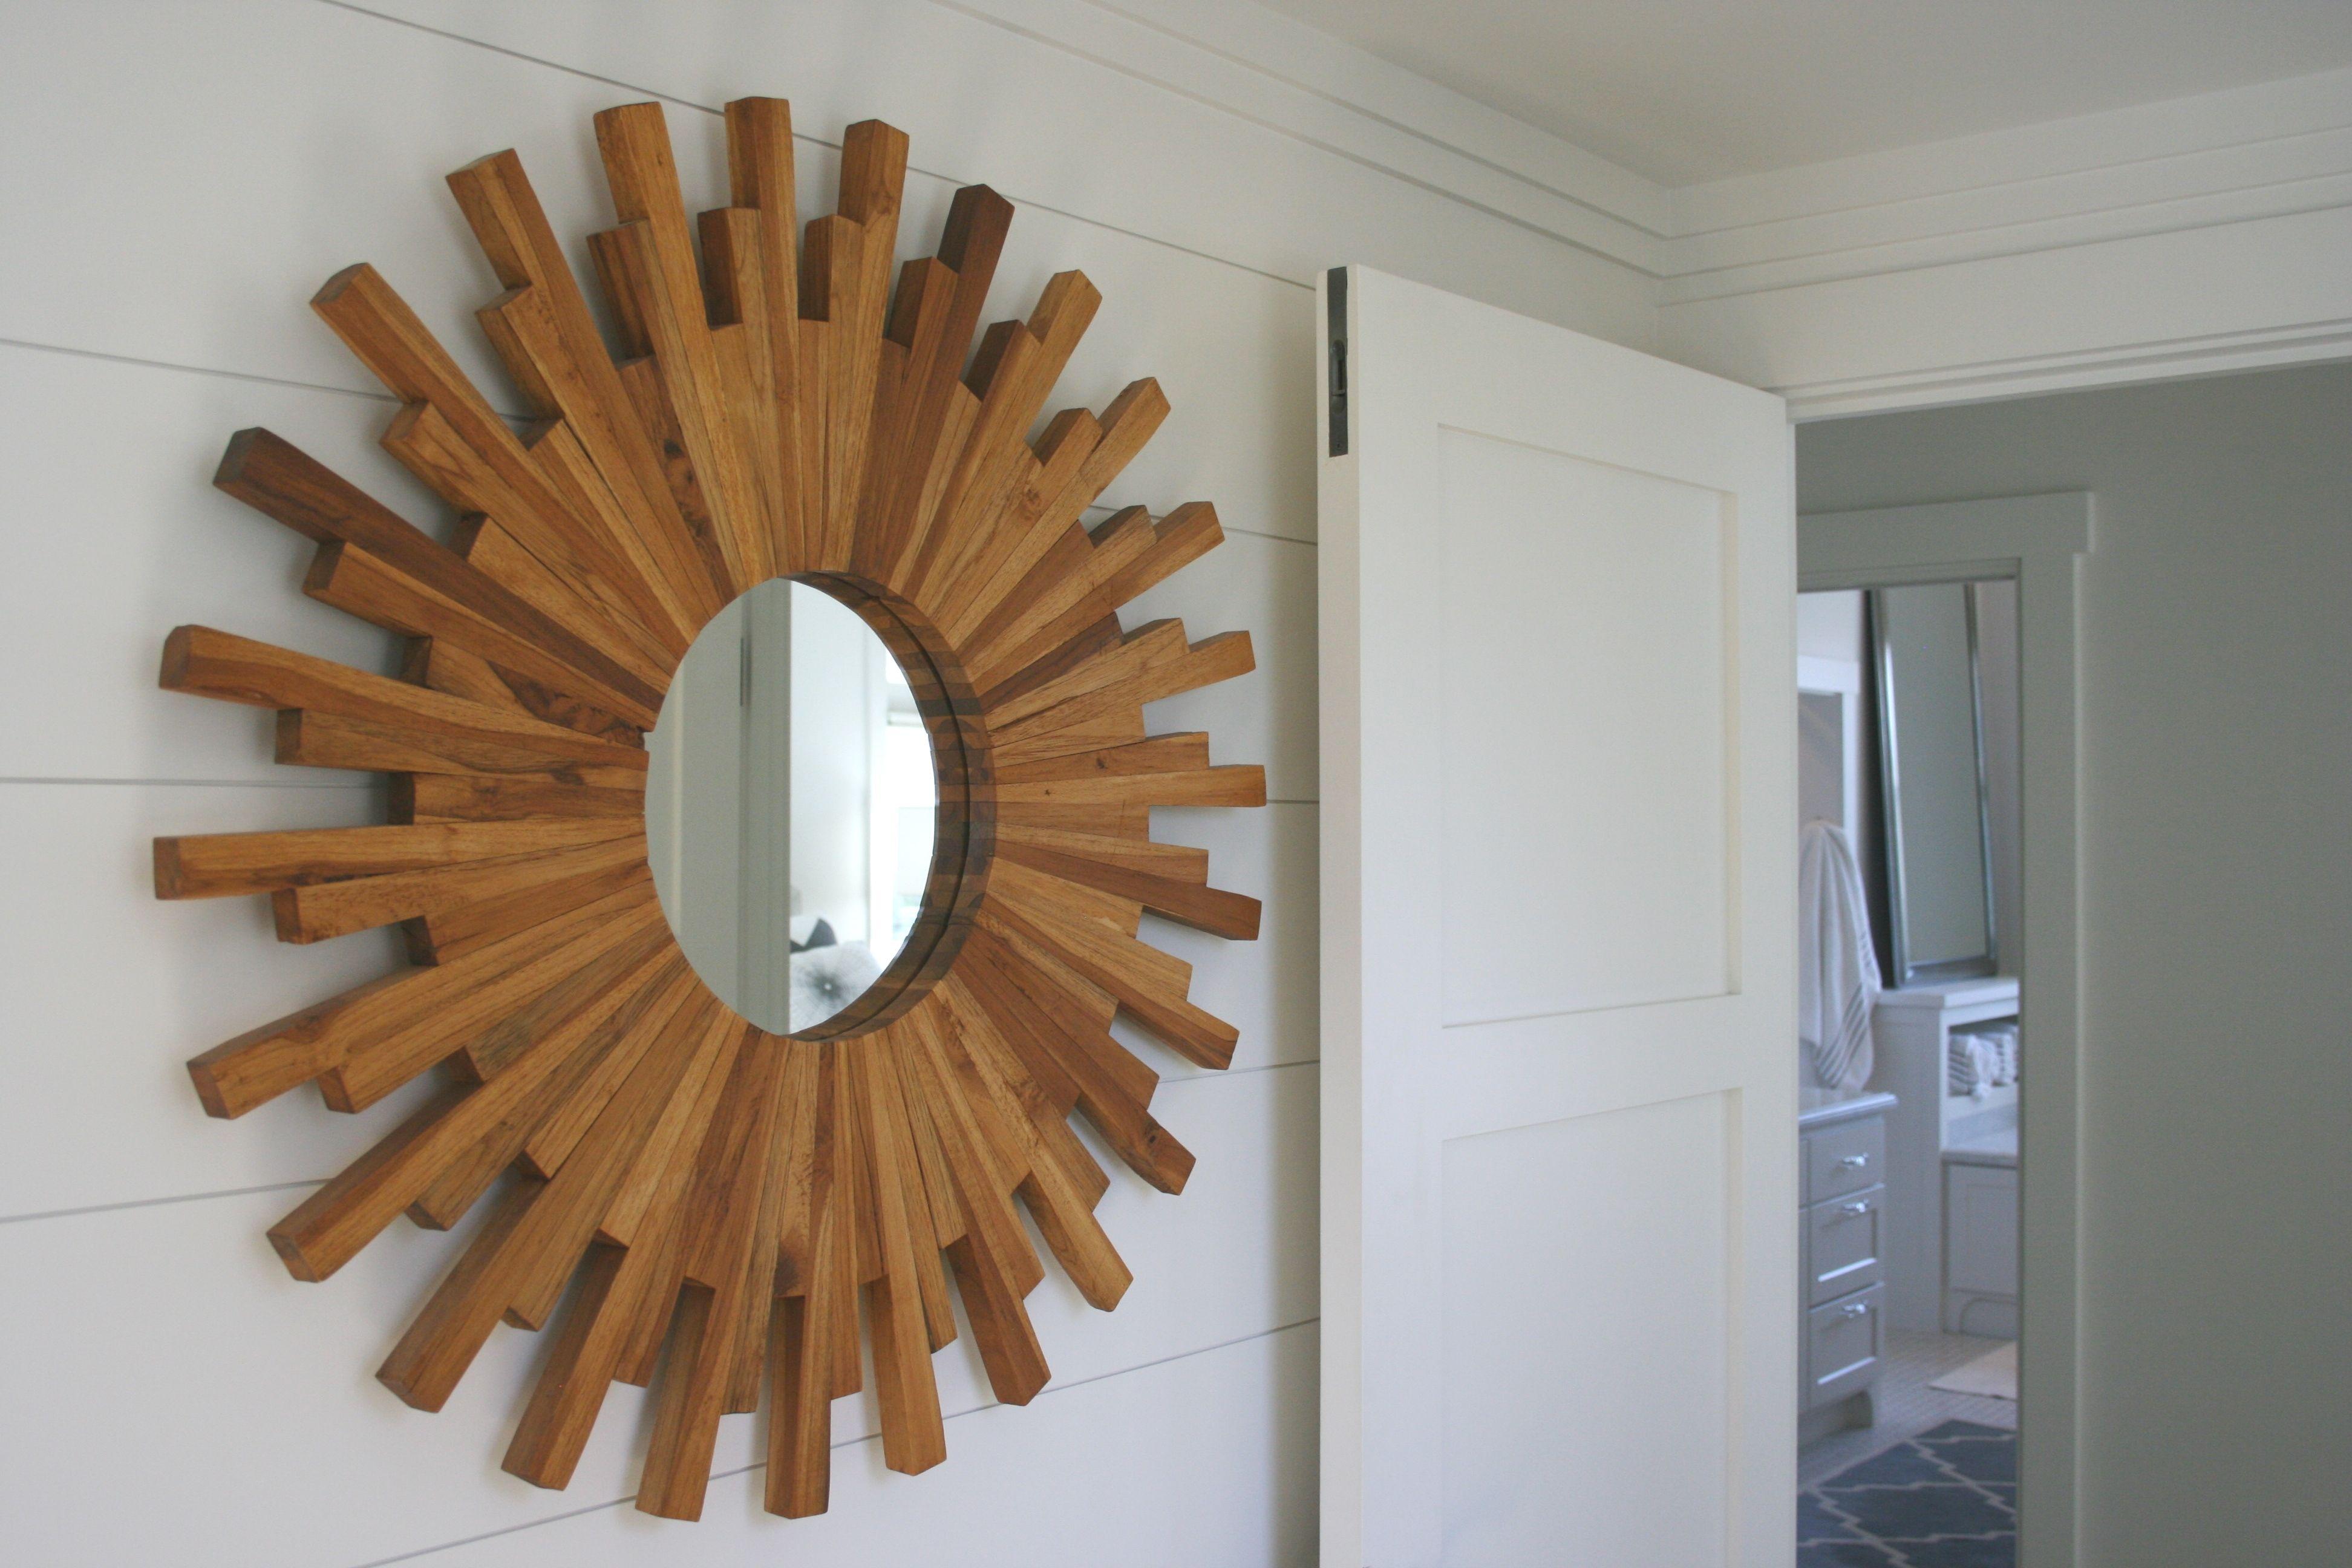 Modern Sunburst Mirror | 2014 Wadsworth Home | Home Intended For Estrela Modern Sunburst Metal Wall Mirrors (View 13 of 30)